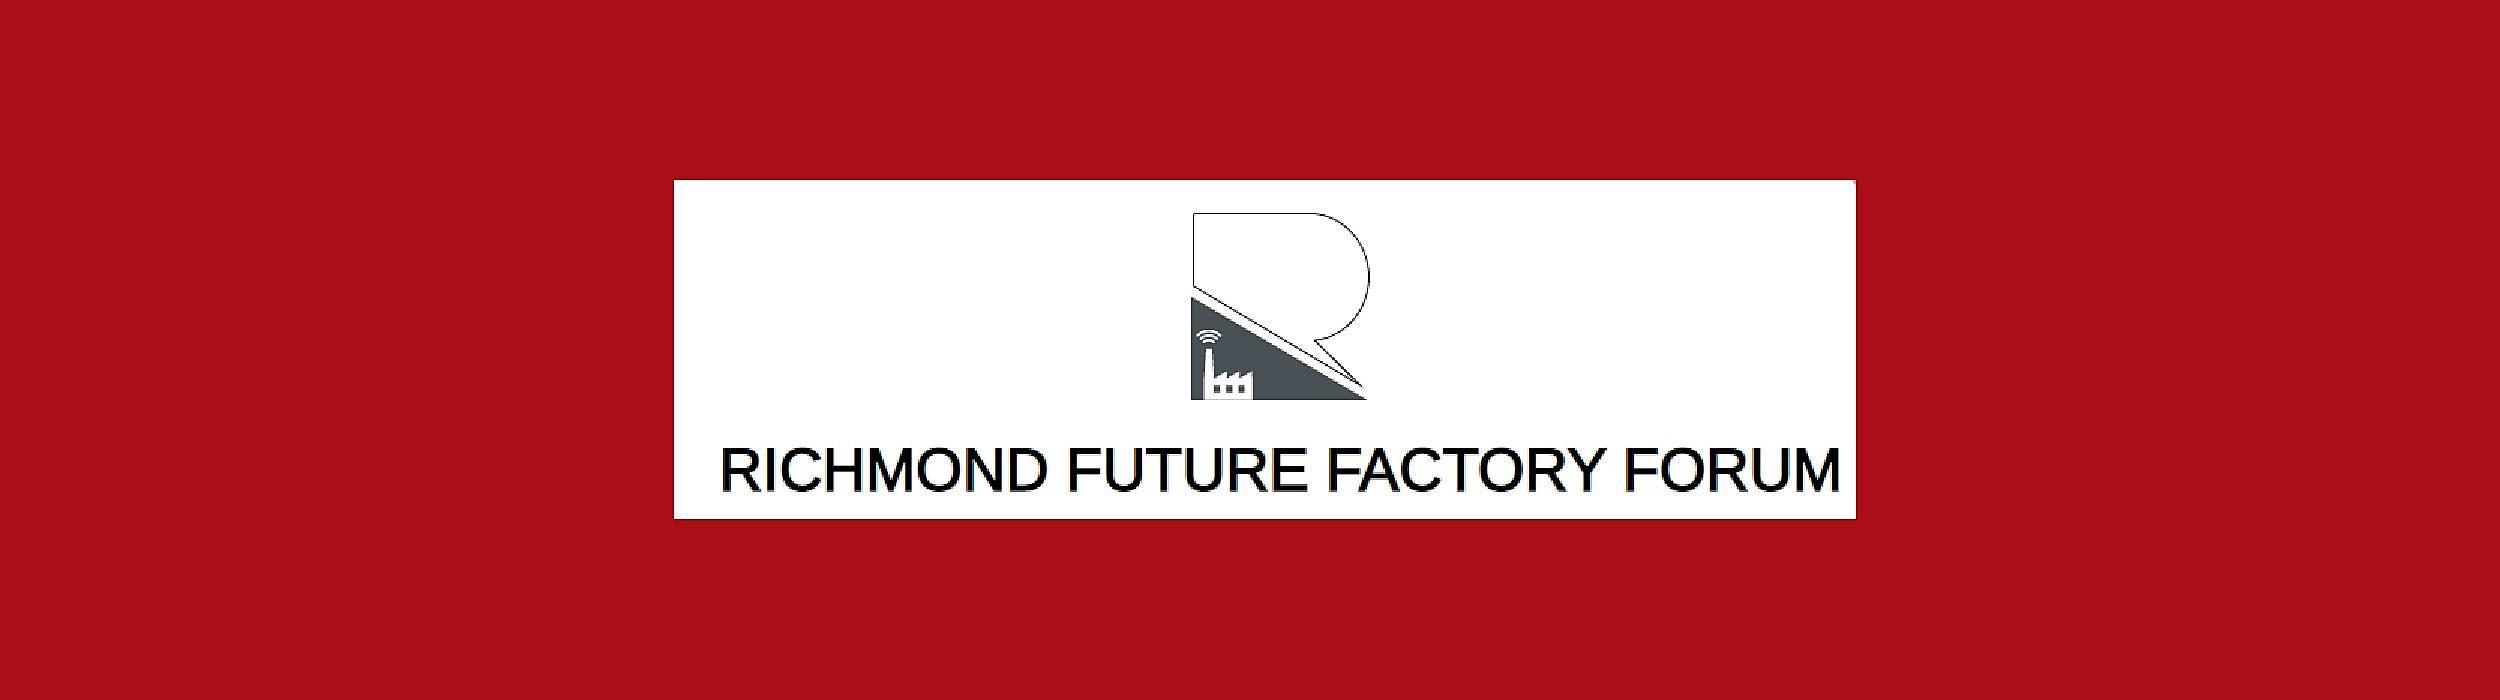 Toyota Material Handling: Richmond Future Factory Forum